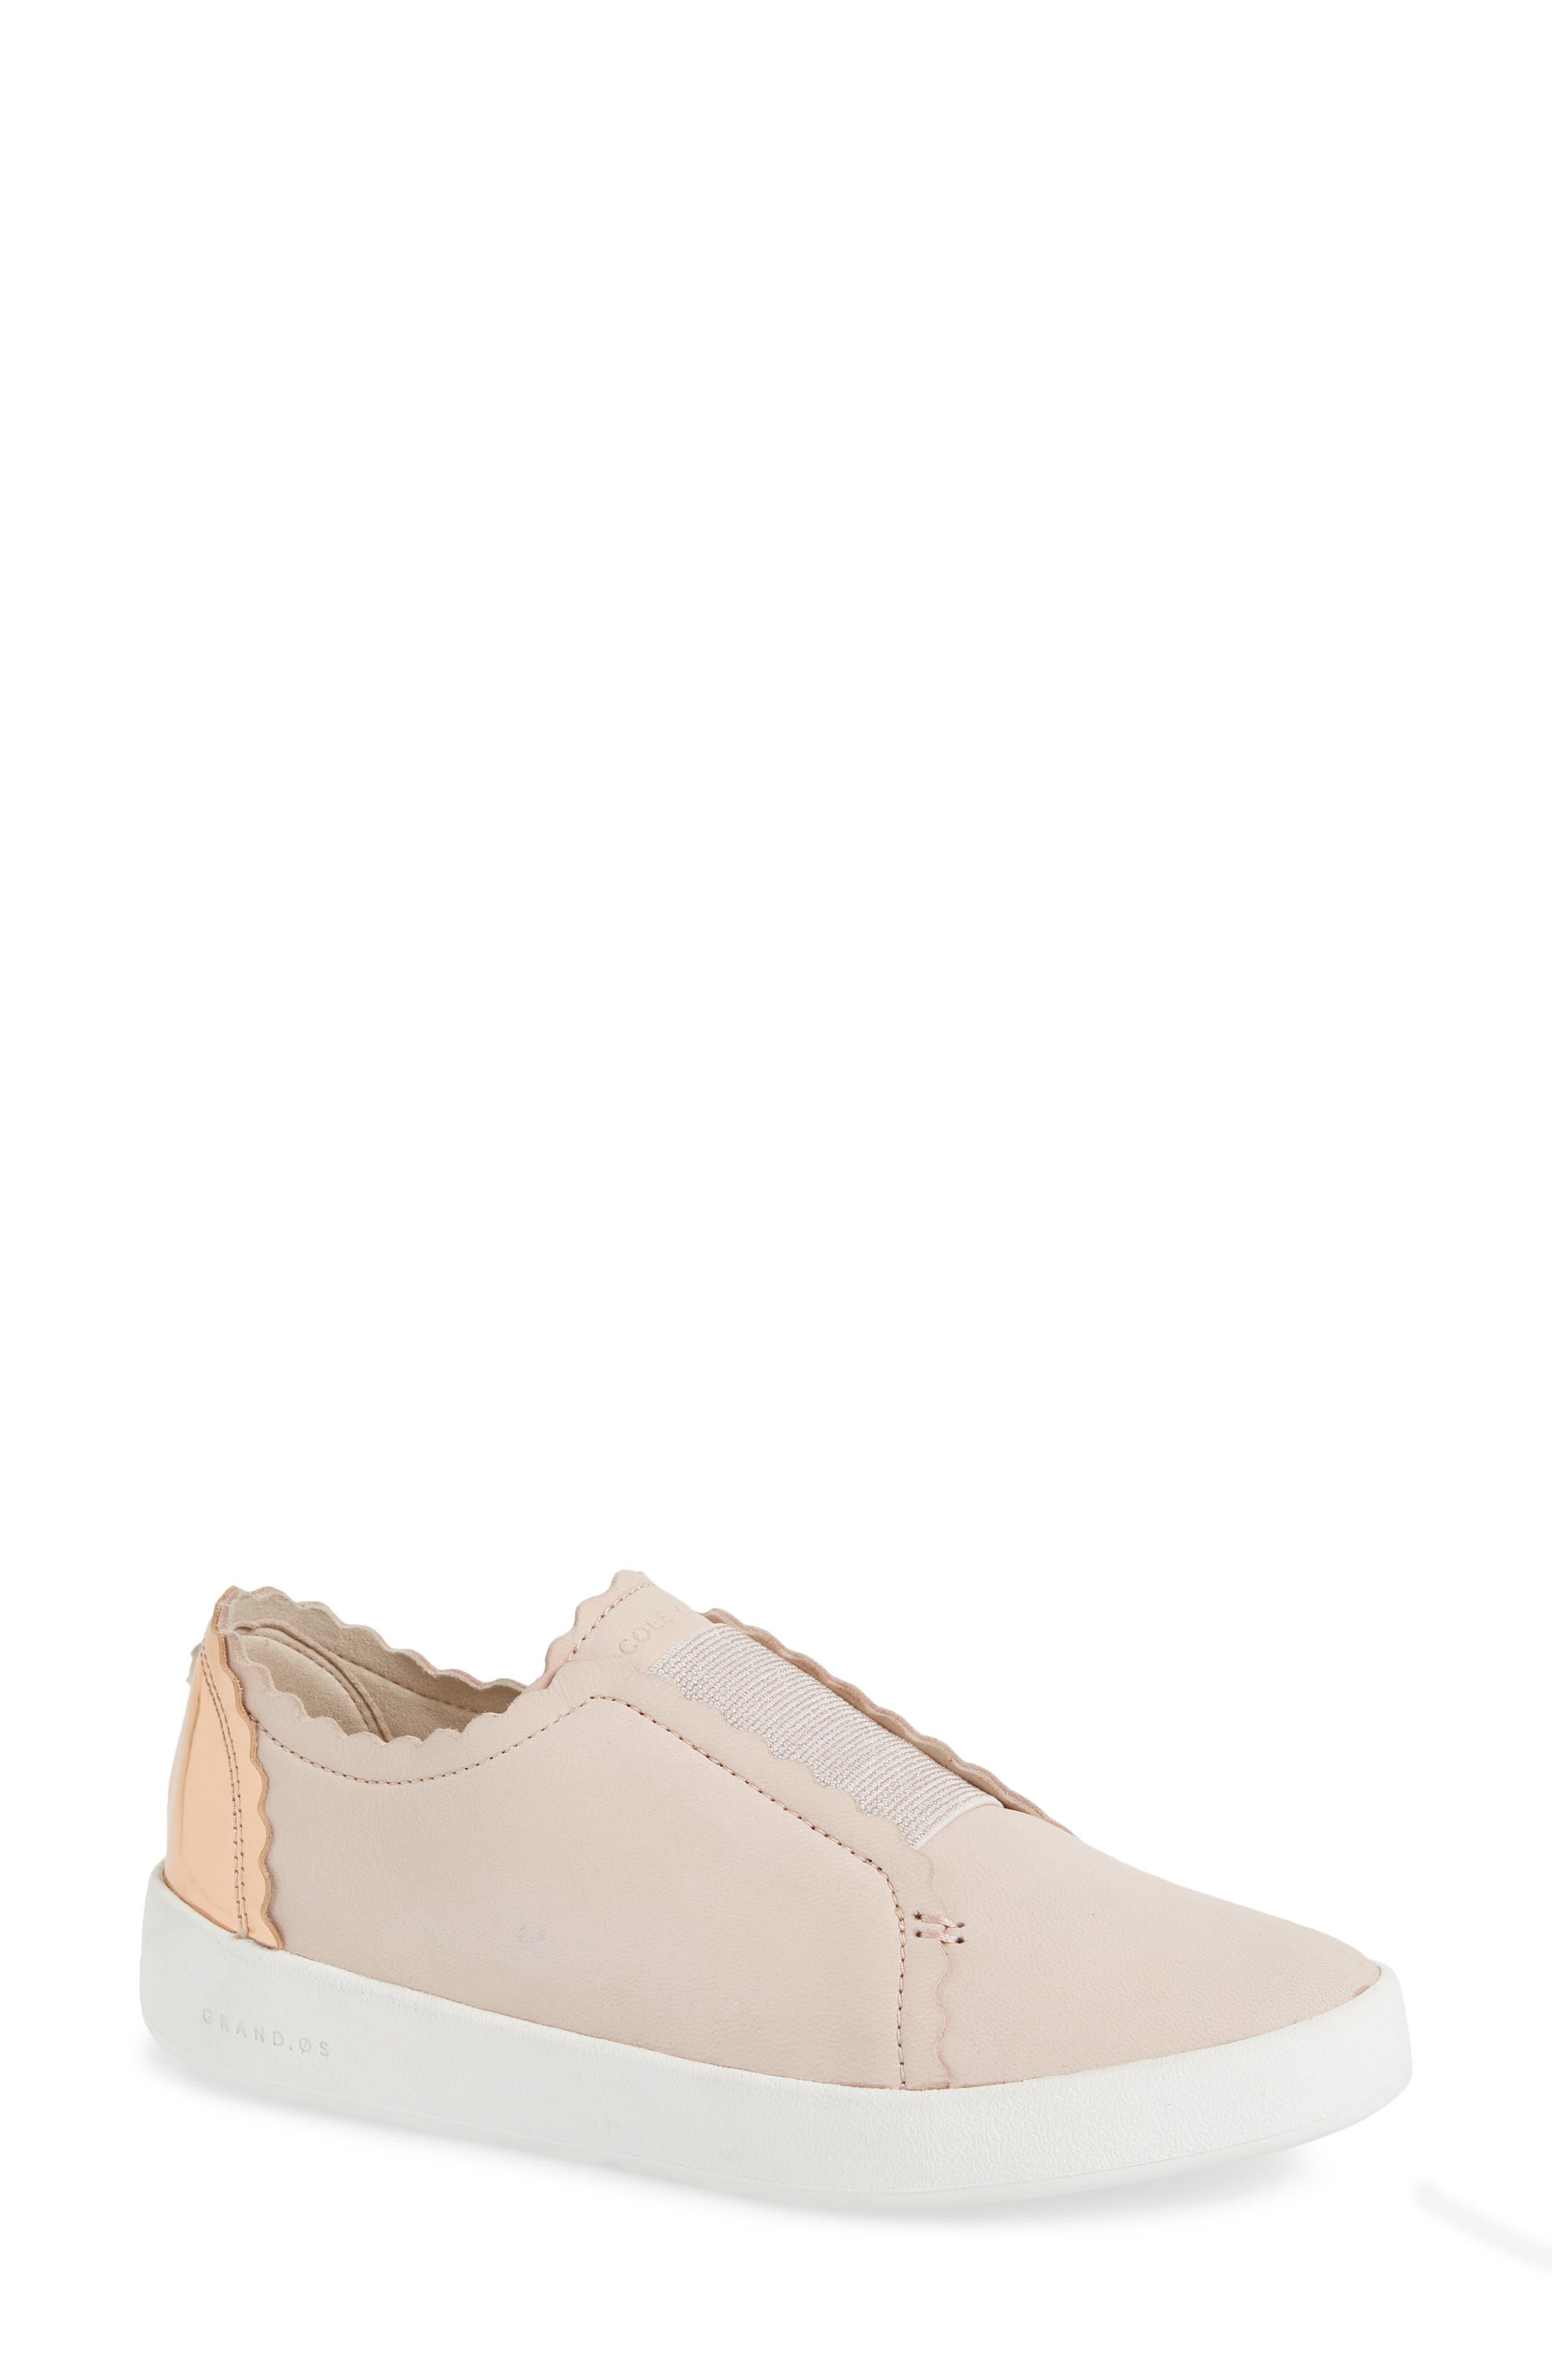 GrandPro Spectator Scalloped Slip-On Sneaker,                         Main,                         color, PEACH BLUSH NUBUCK